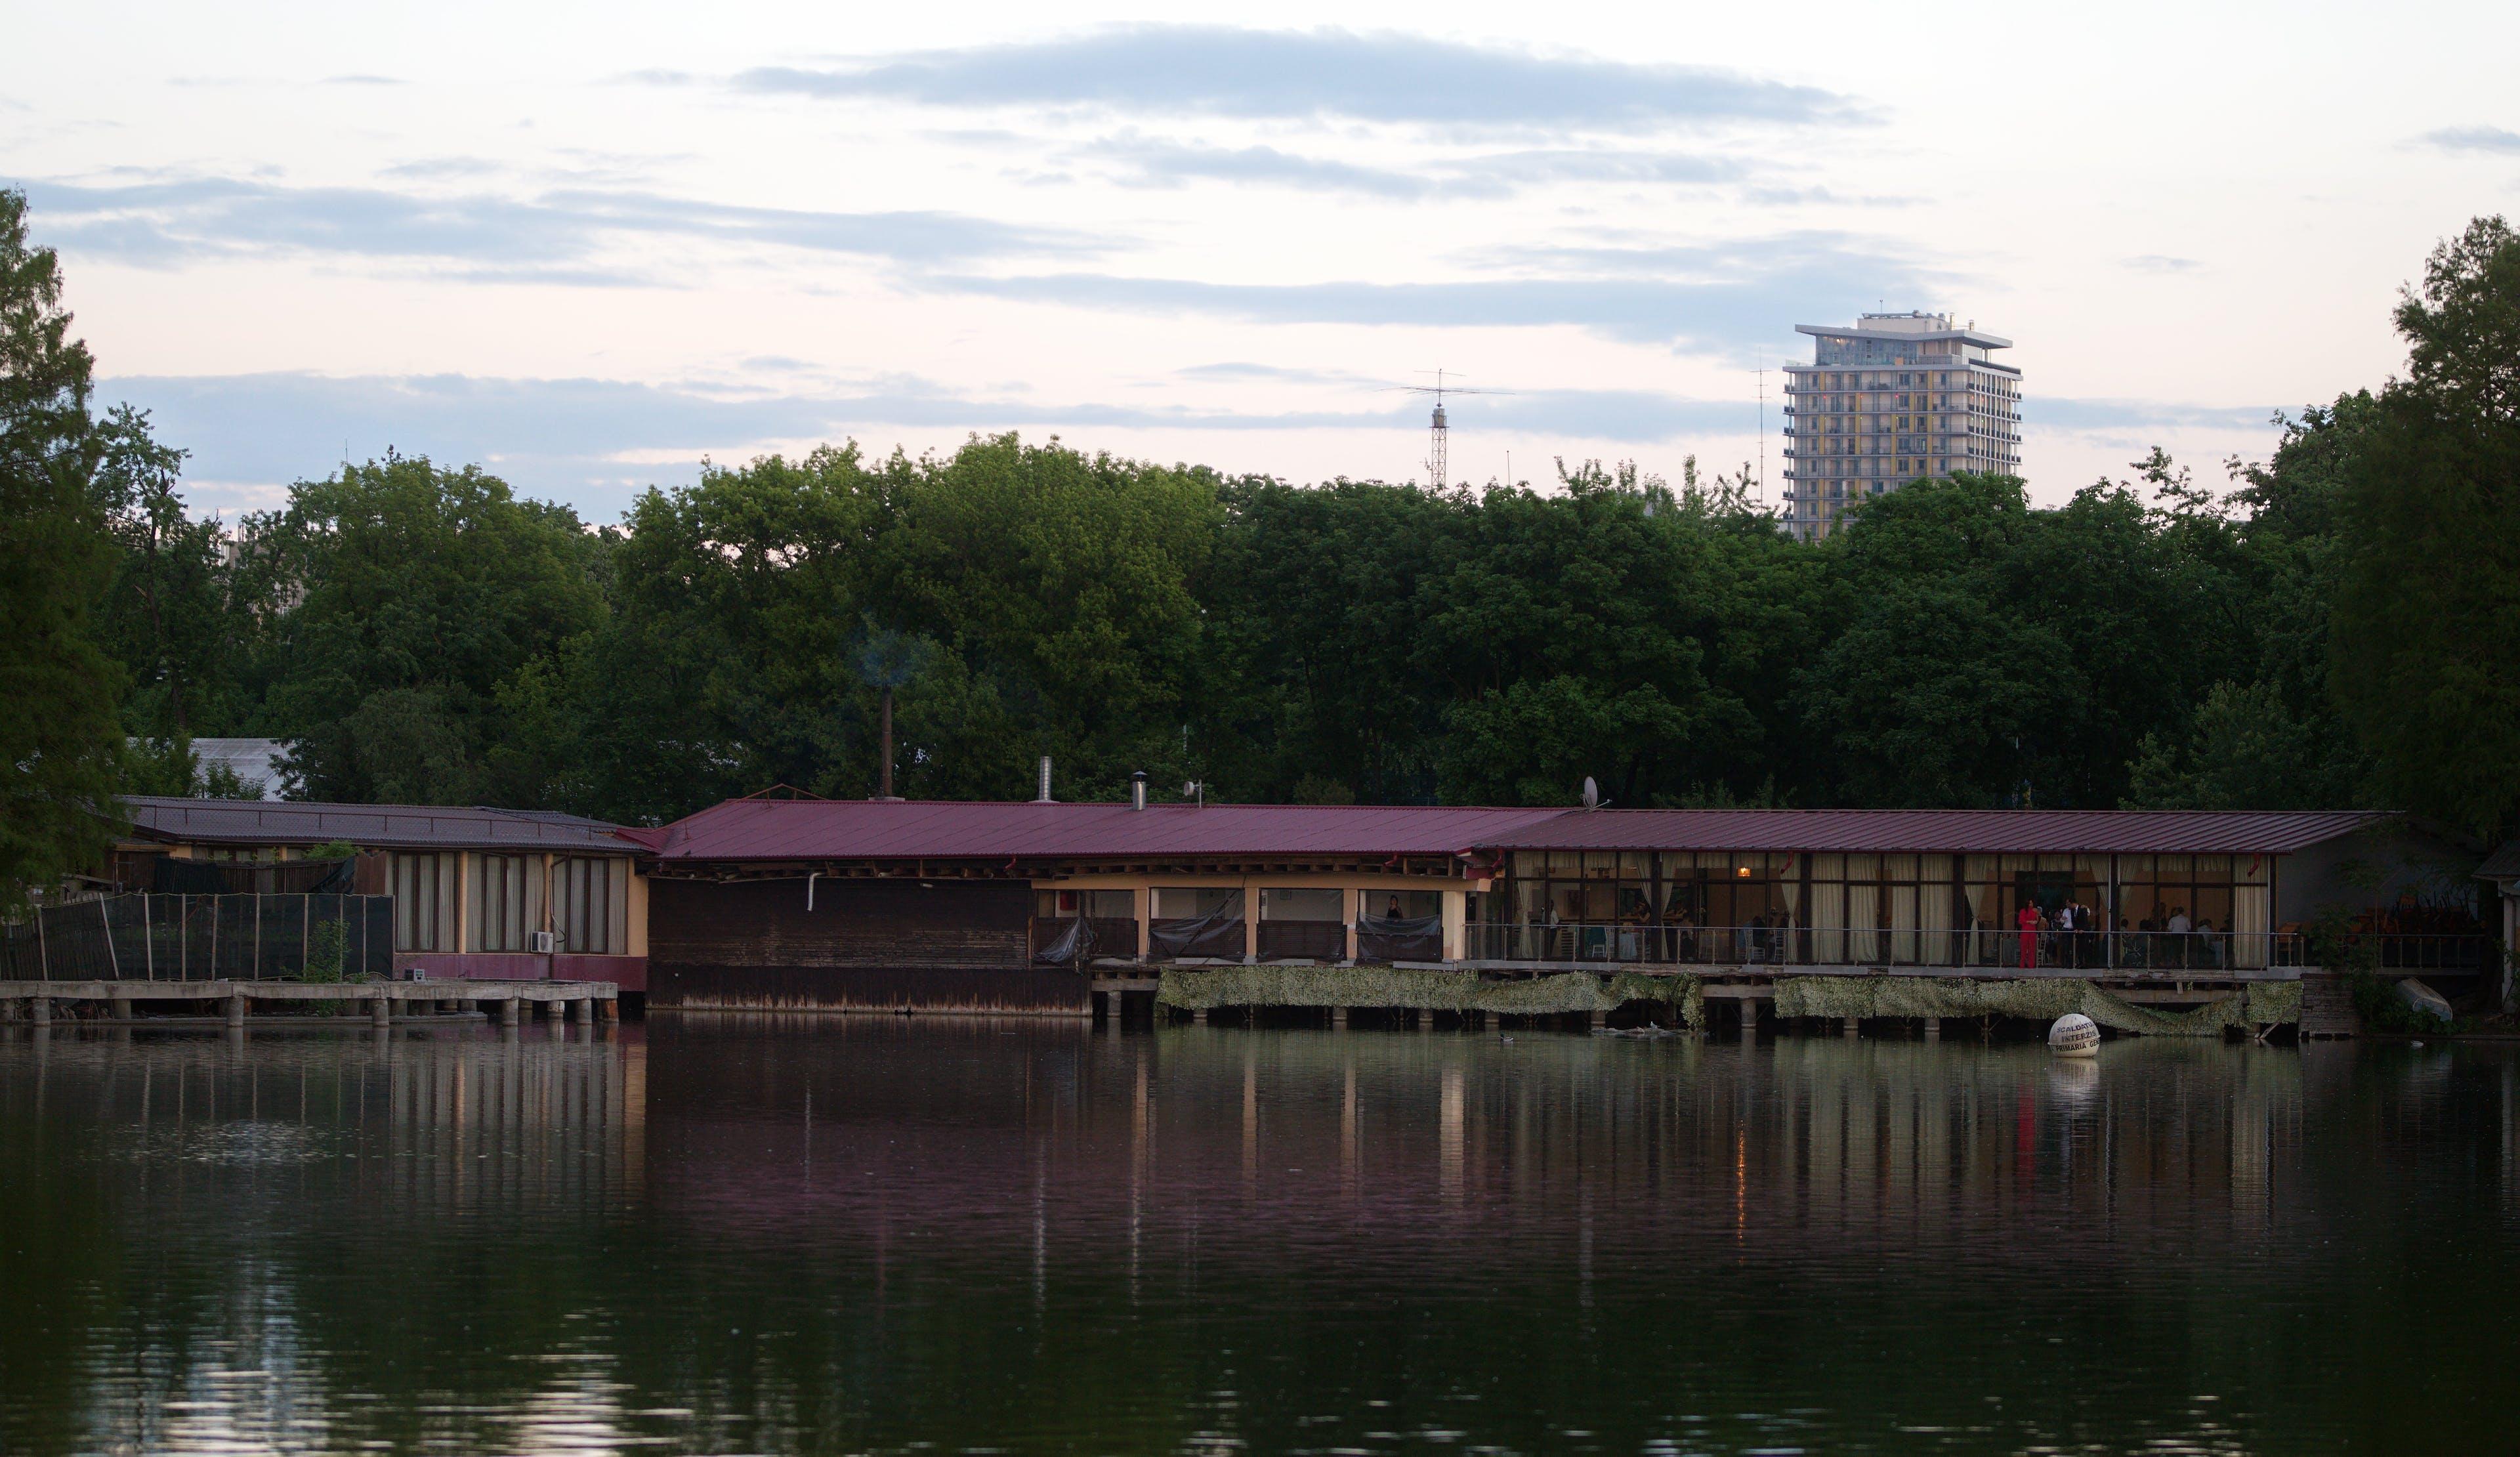 Základová fotografie zdarma na téma budovy, jezero, krajina, mraky